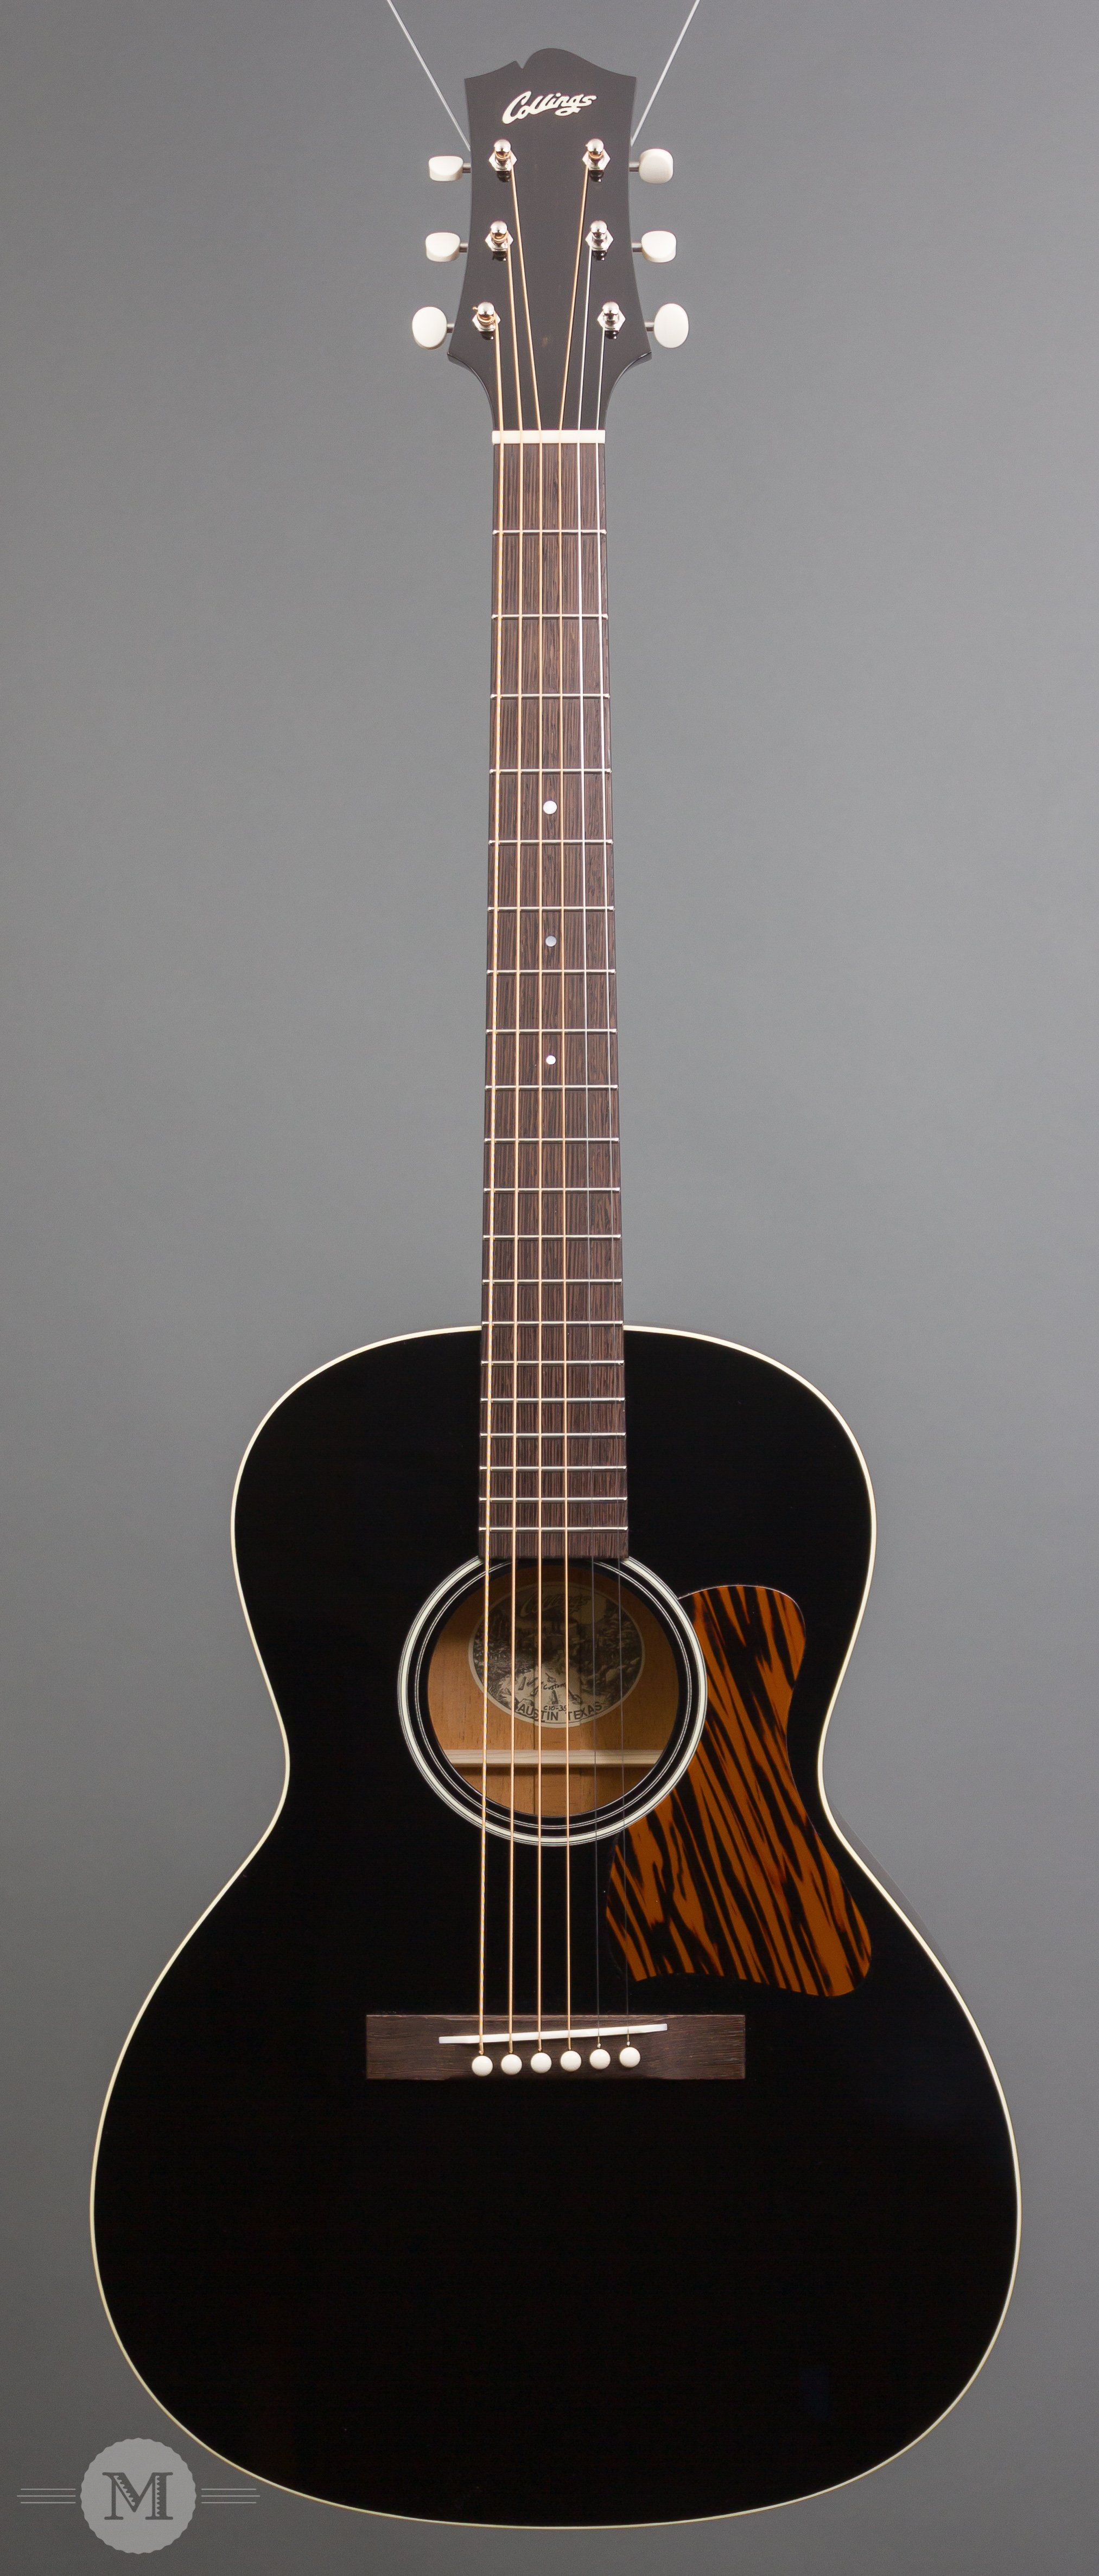 Collings Acoustic Guitars C10 35 Jet Black Top